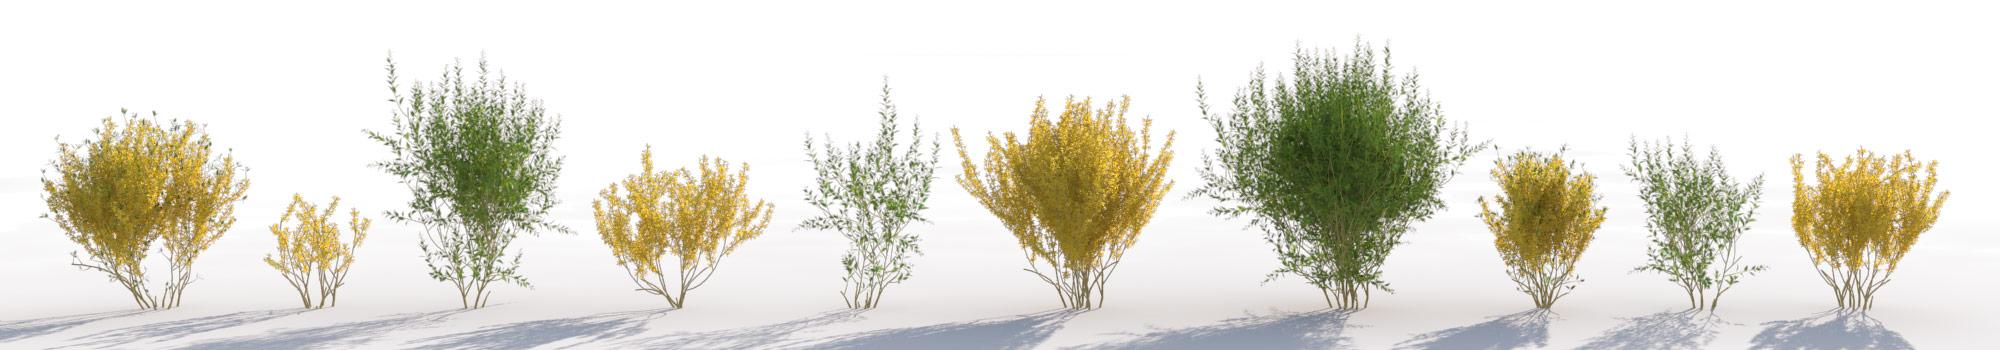 灌木丛3D模型MAX格式 VIZPARK – FORSYTHIA